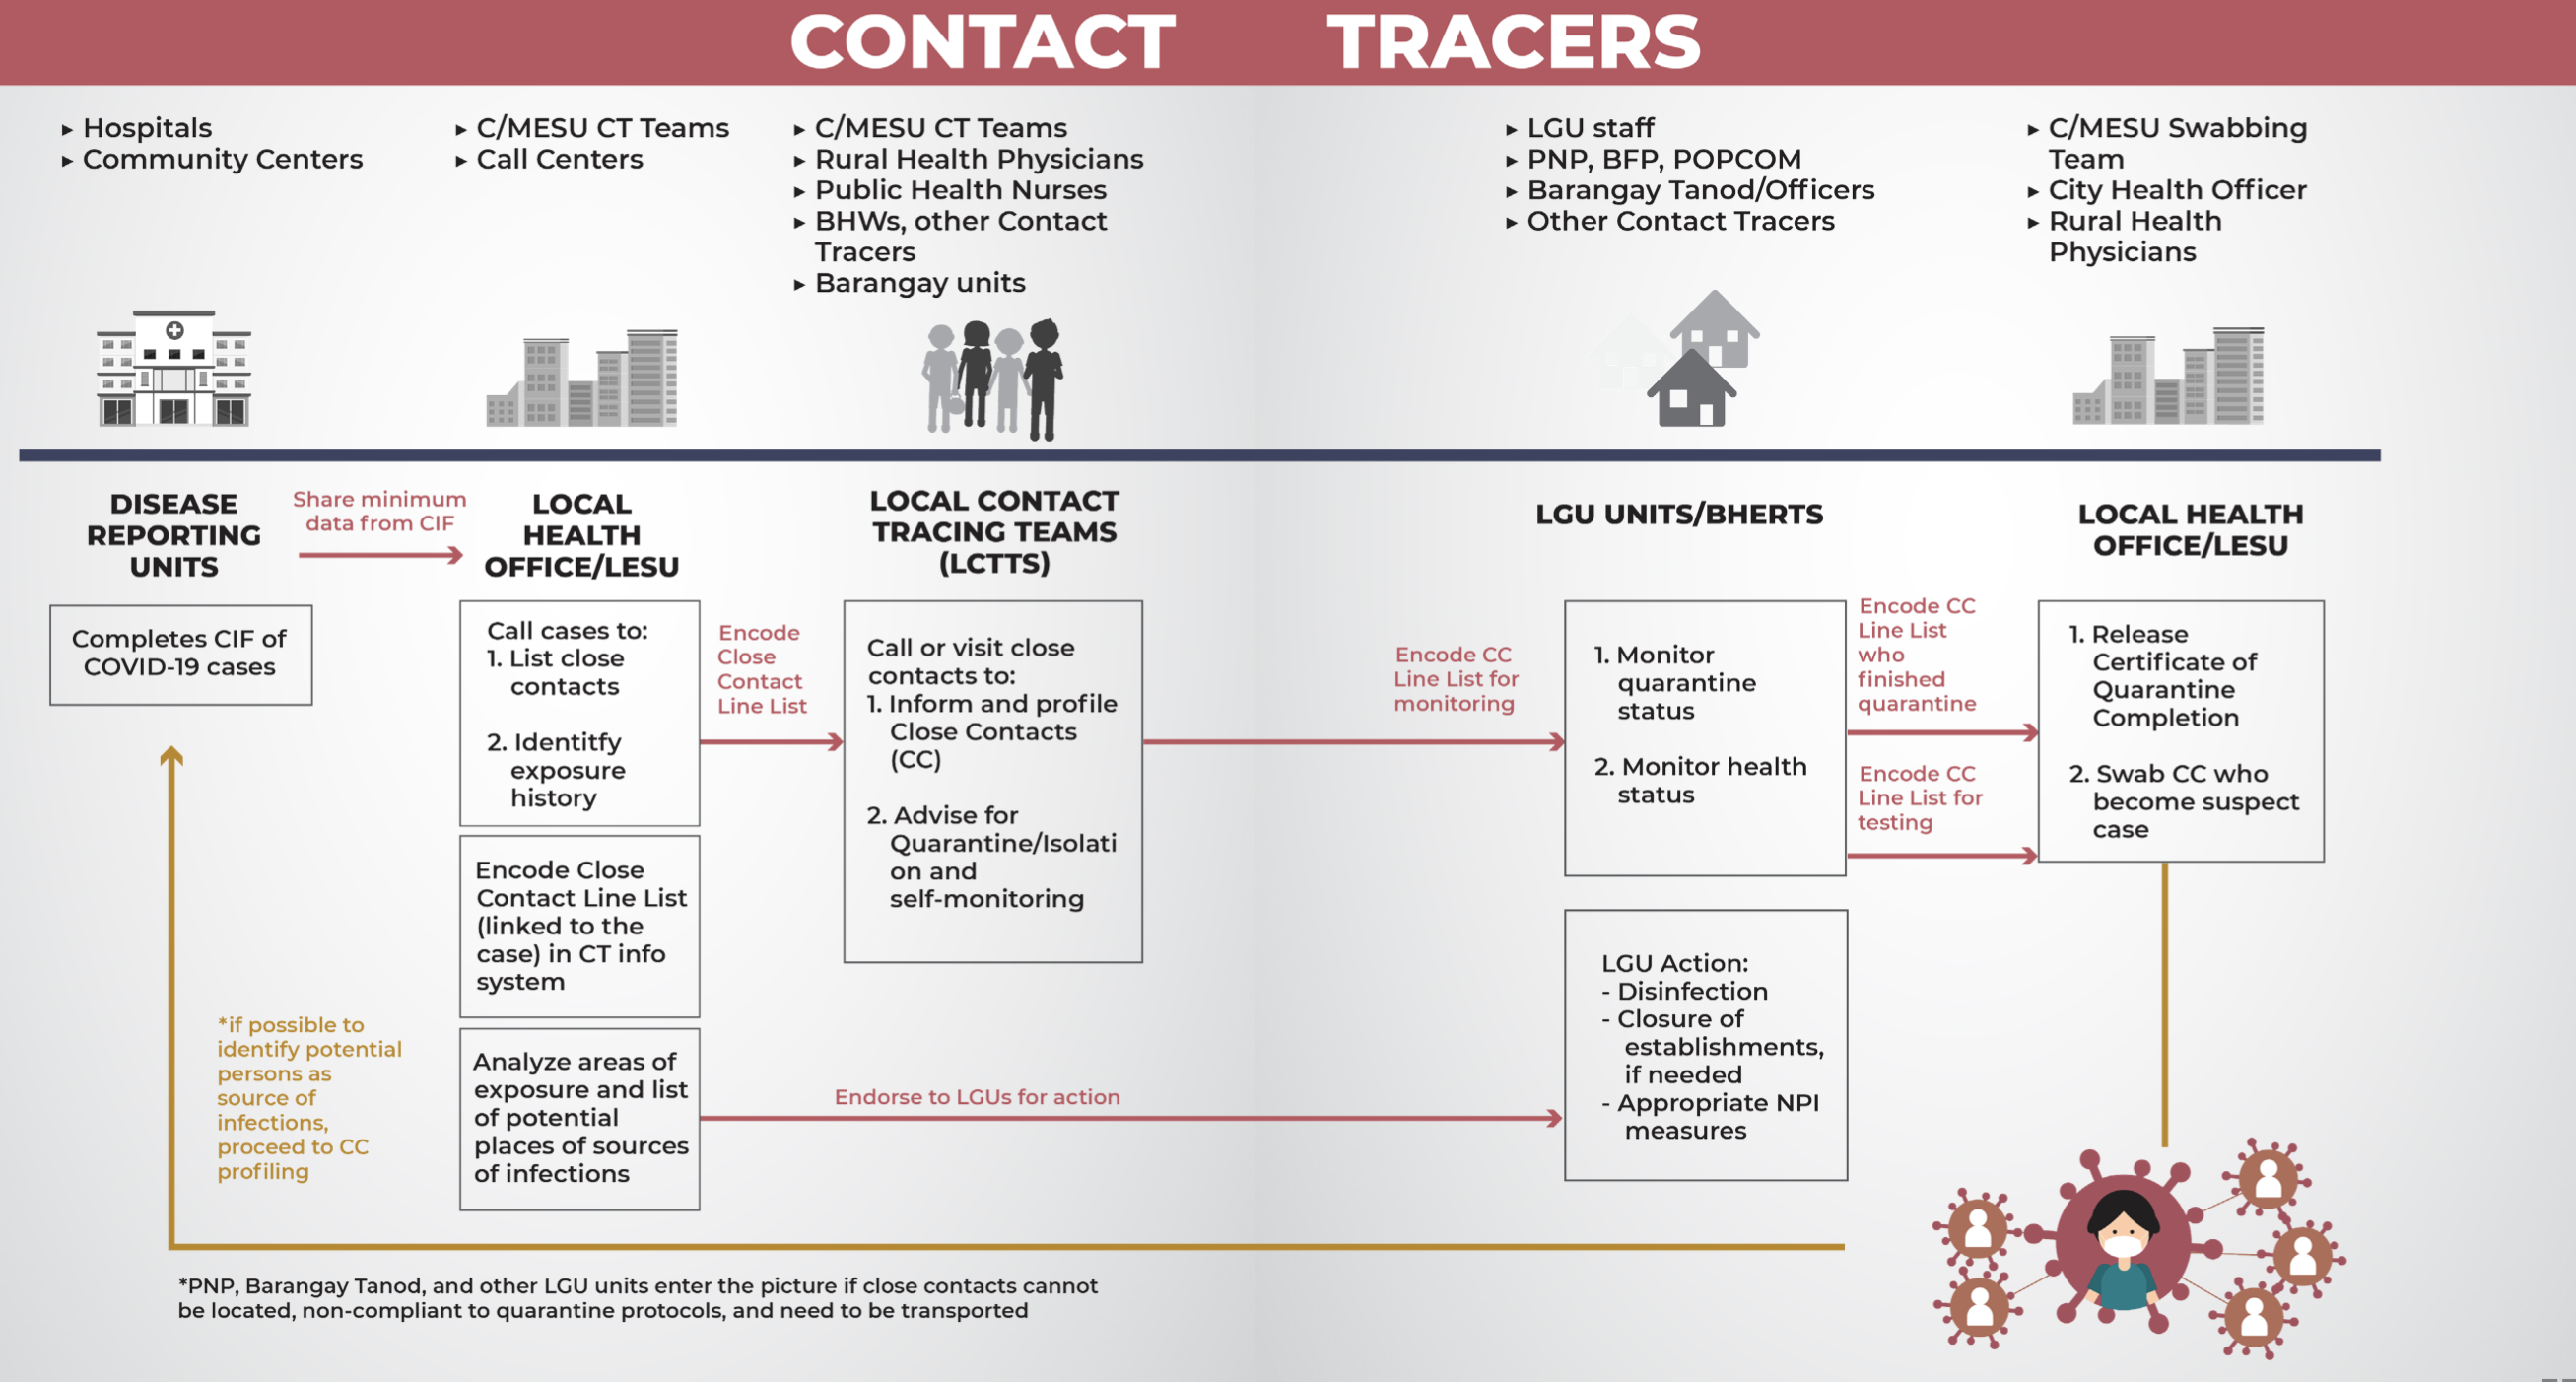 Contact Tracing Process from LGU Contact Tracing Manual